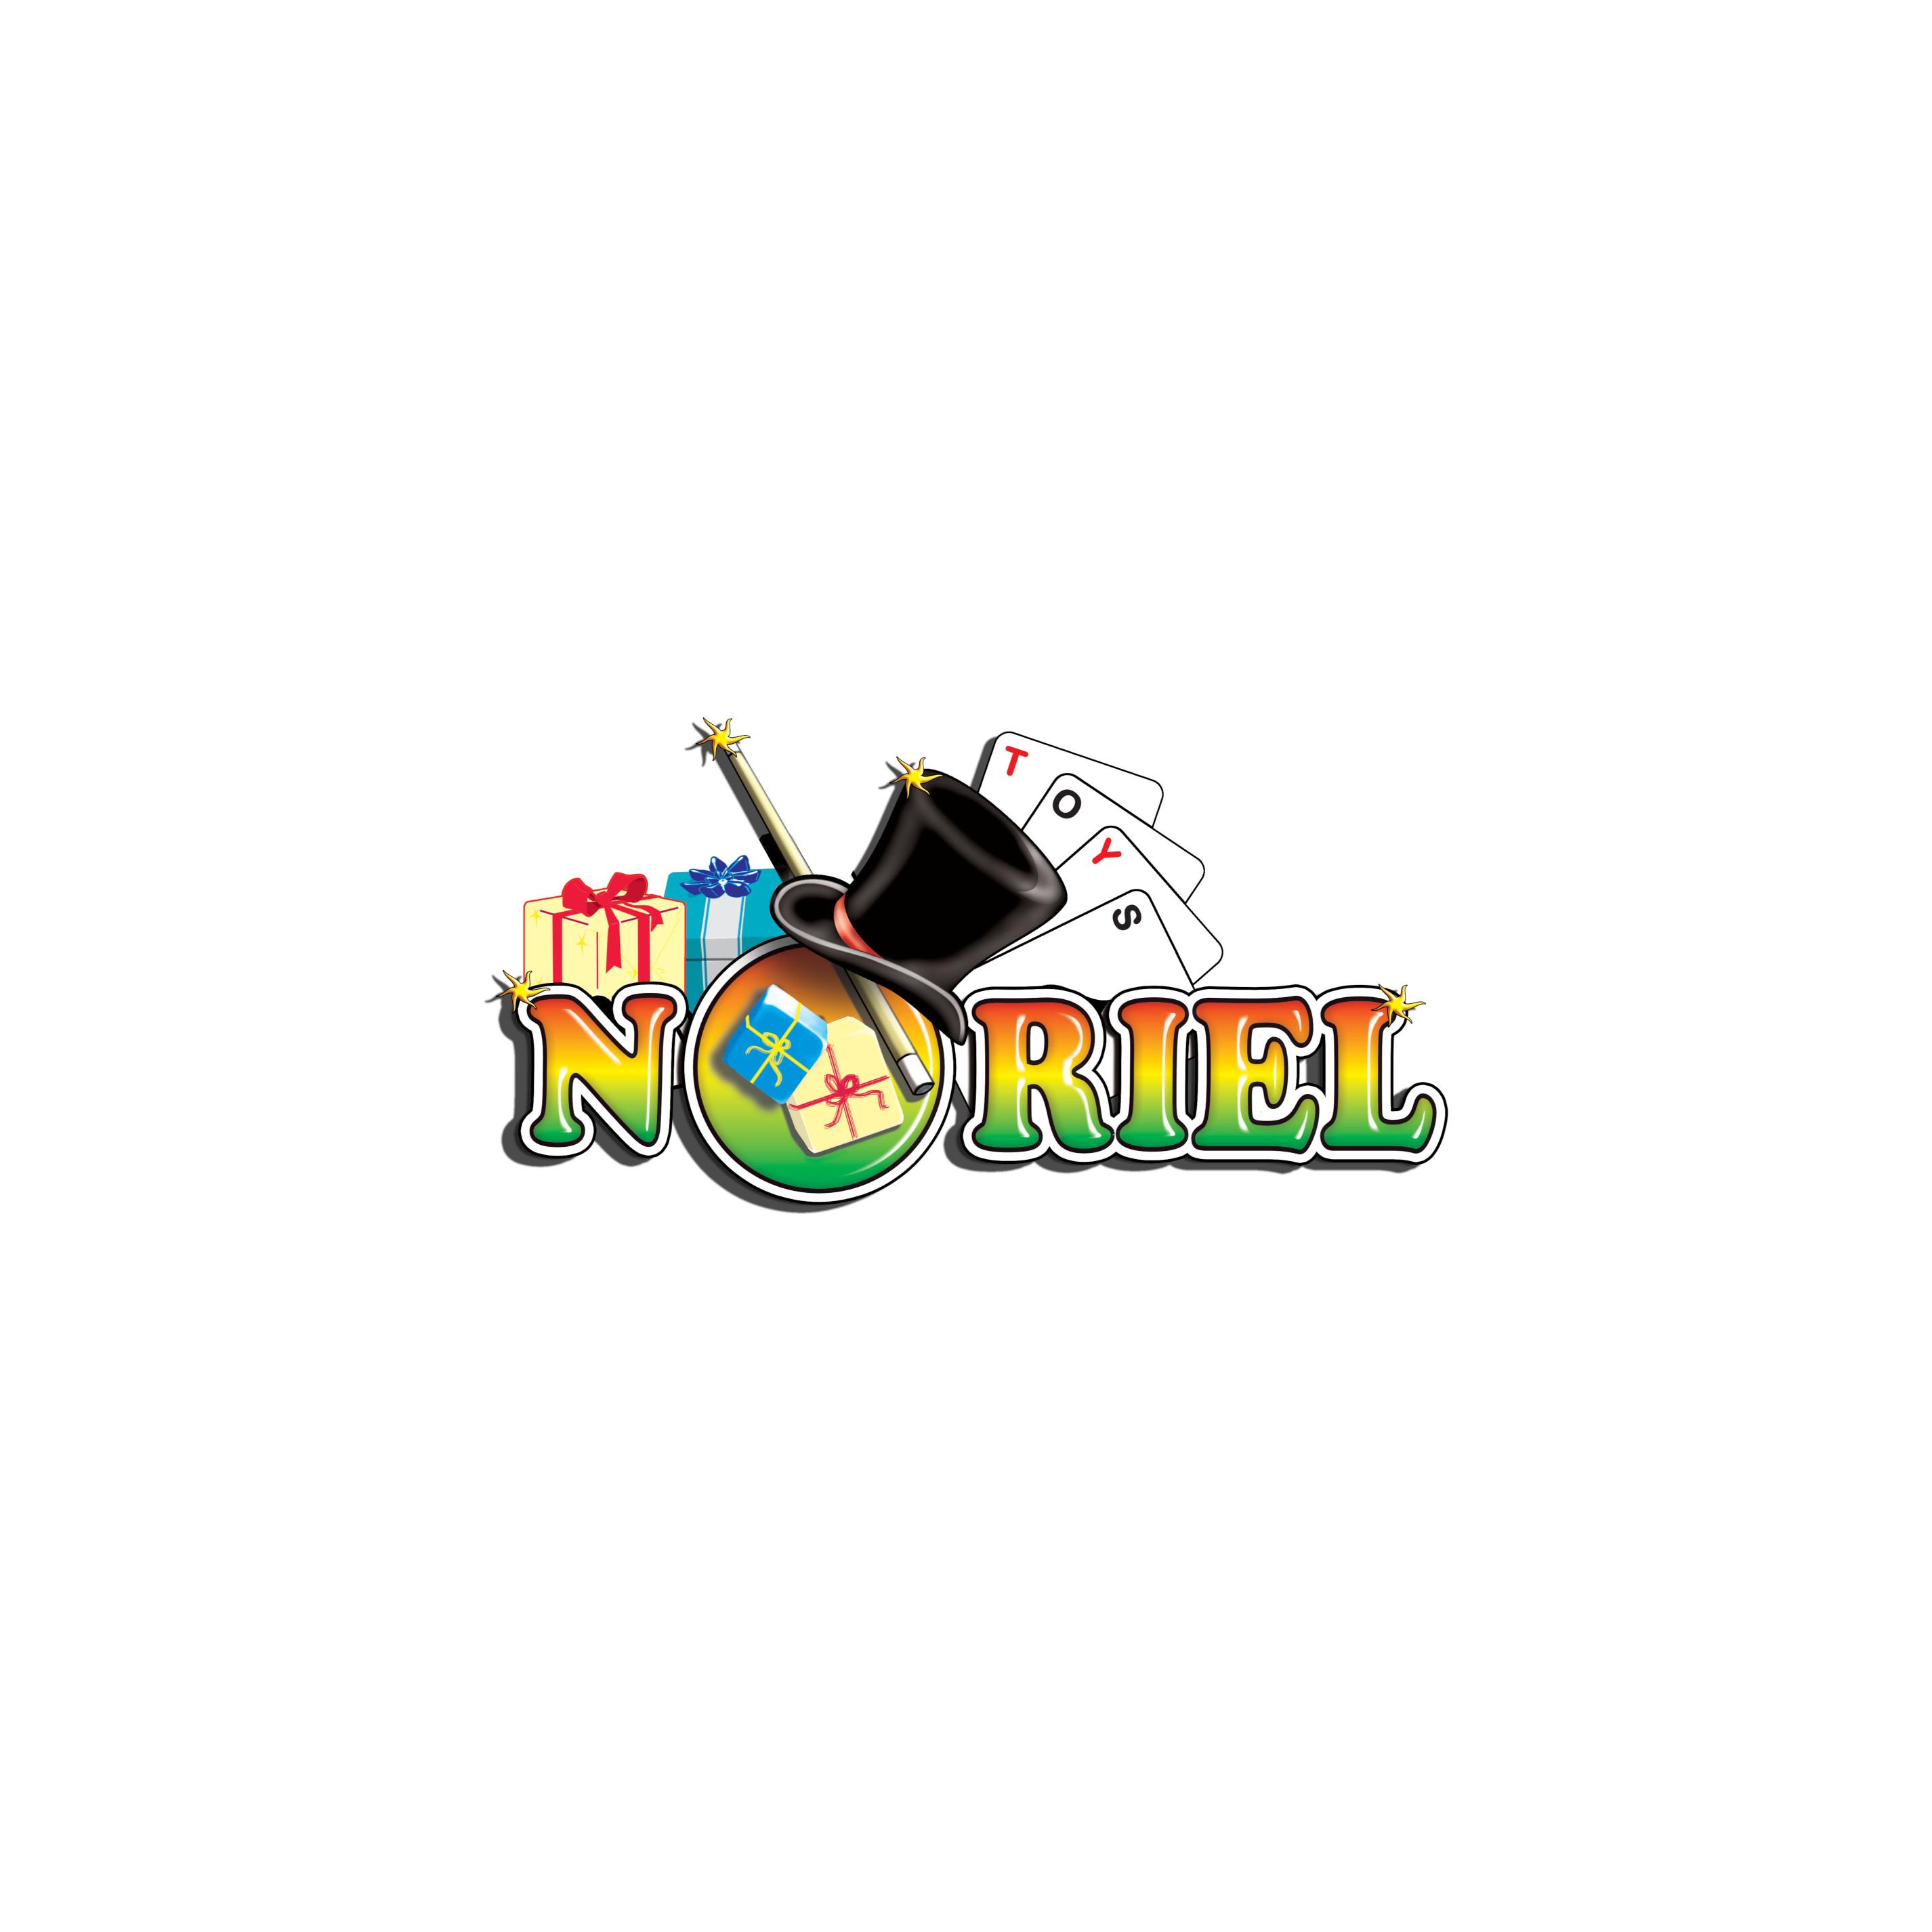 INT_N1127_001w Jucarie interactiva Noriel Games, Purcelul pofticios